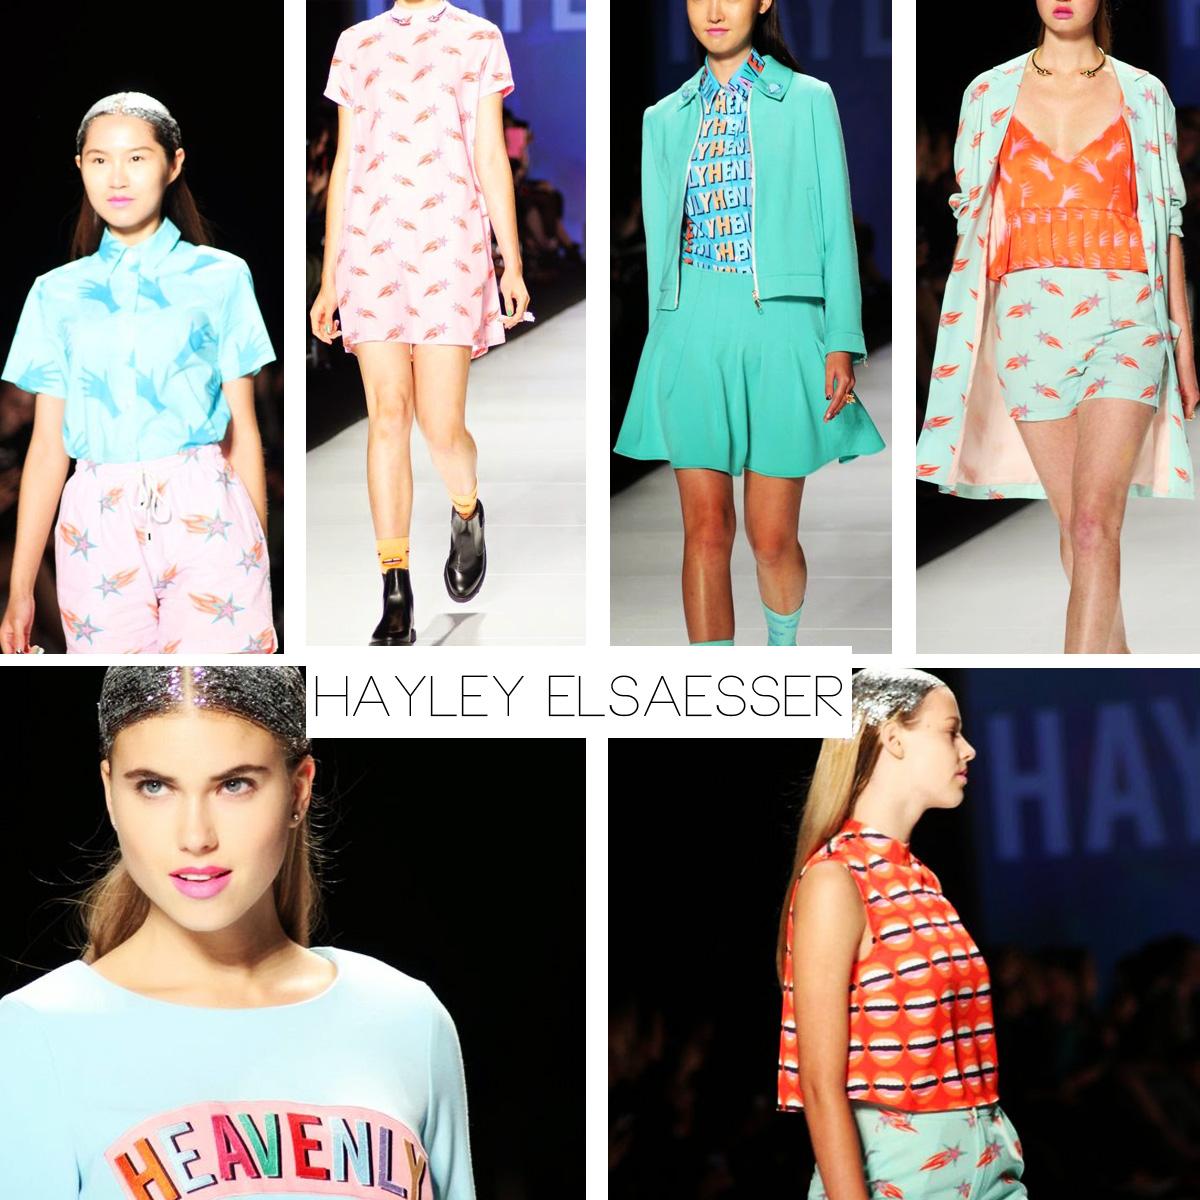 toronto fashion week 07 hayley elsaesser